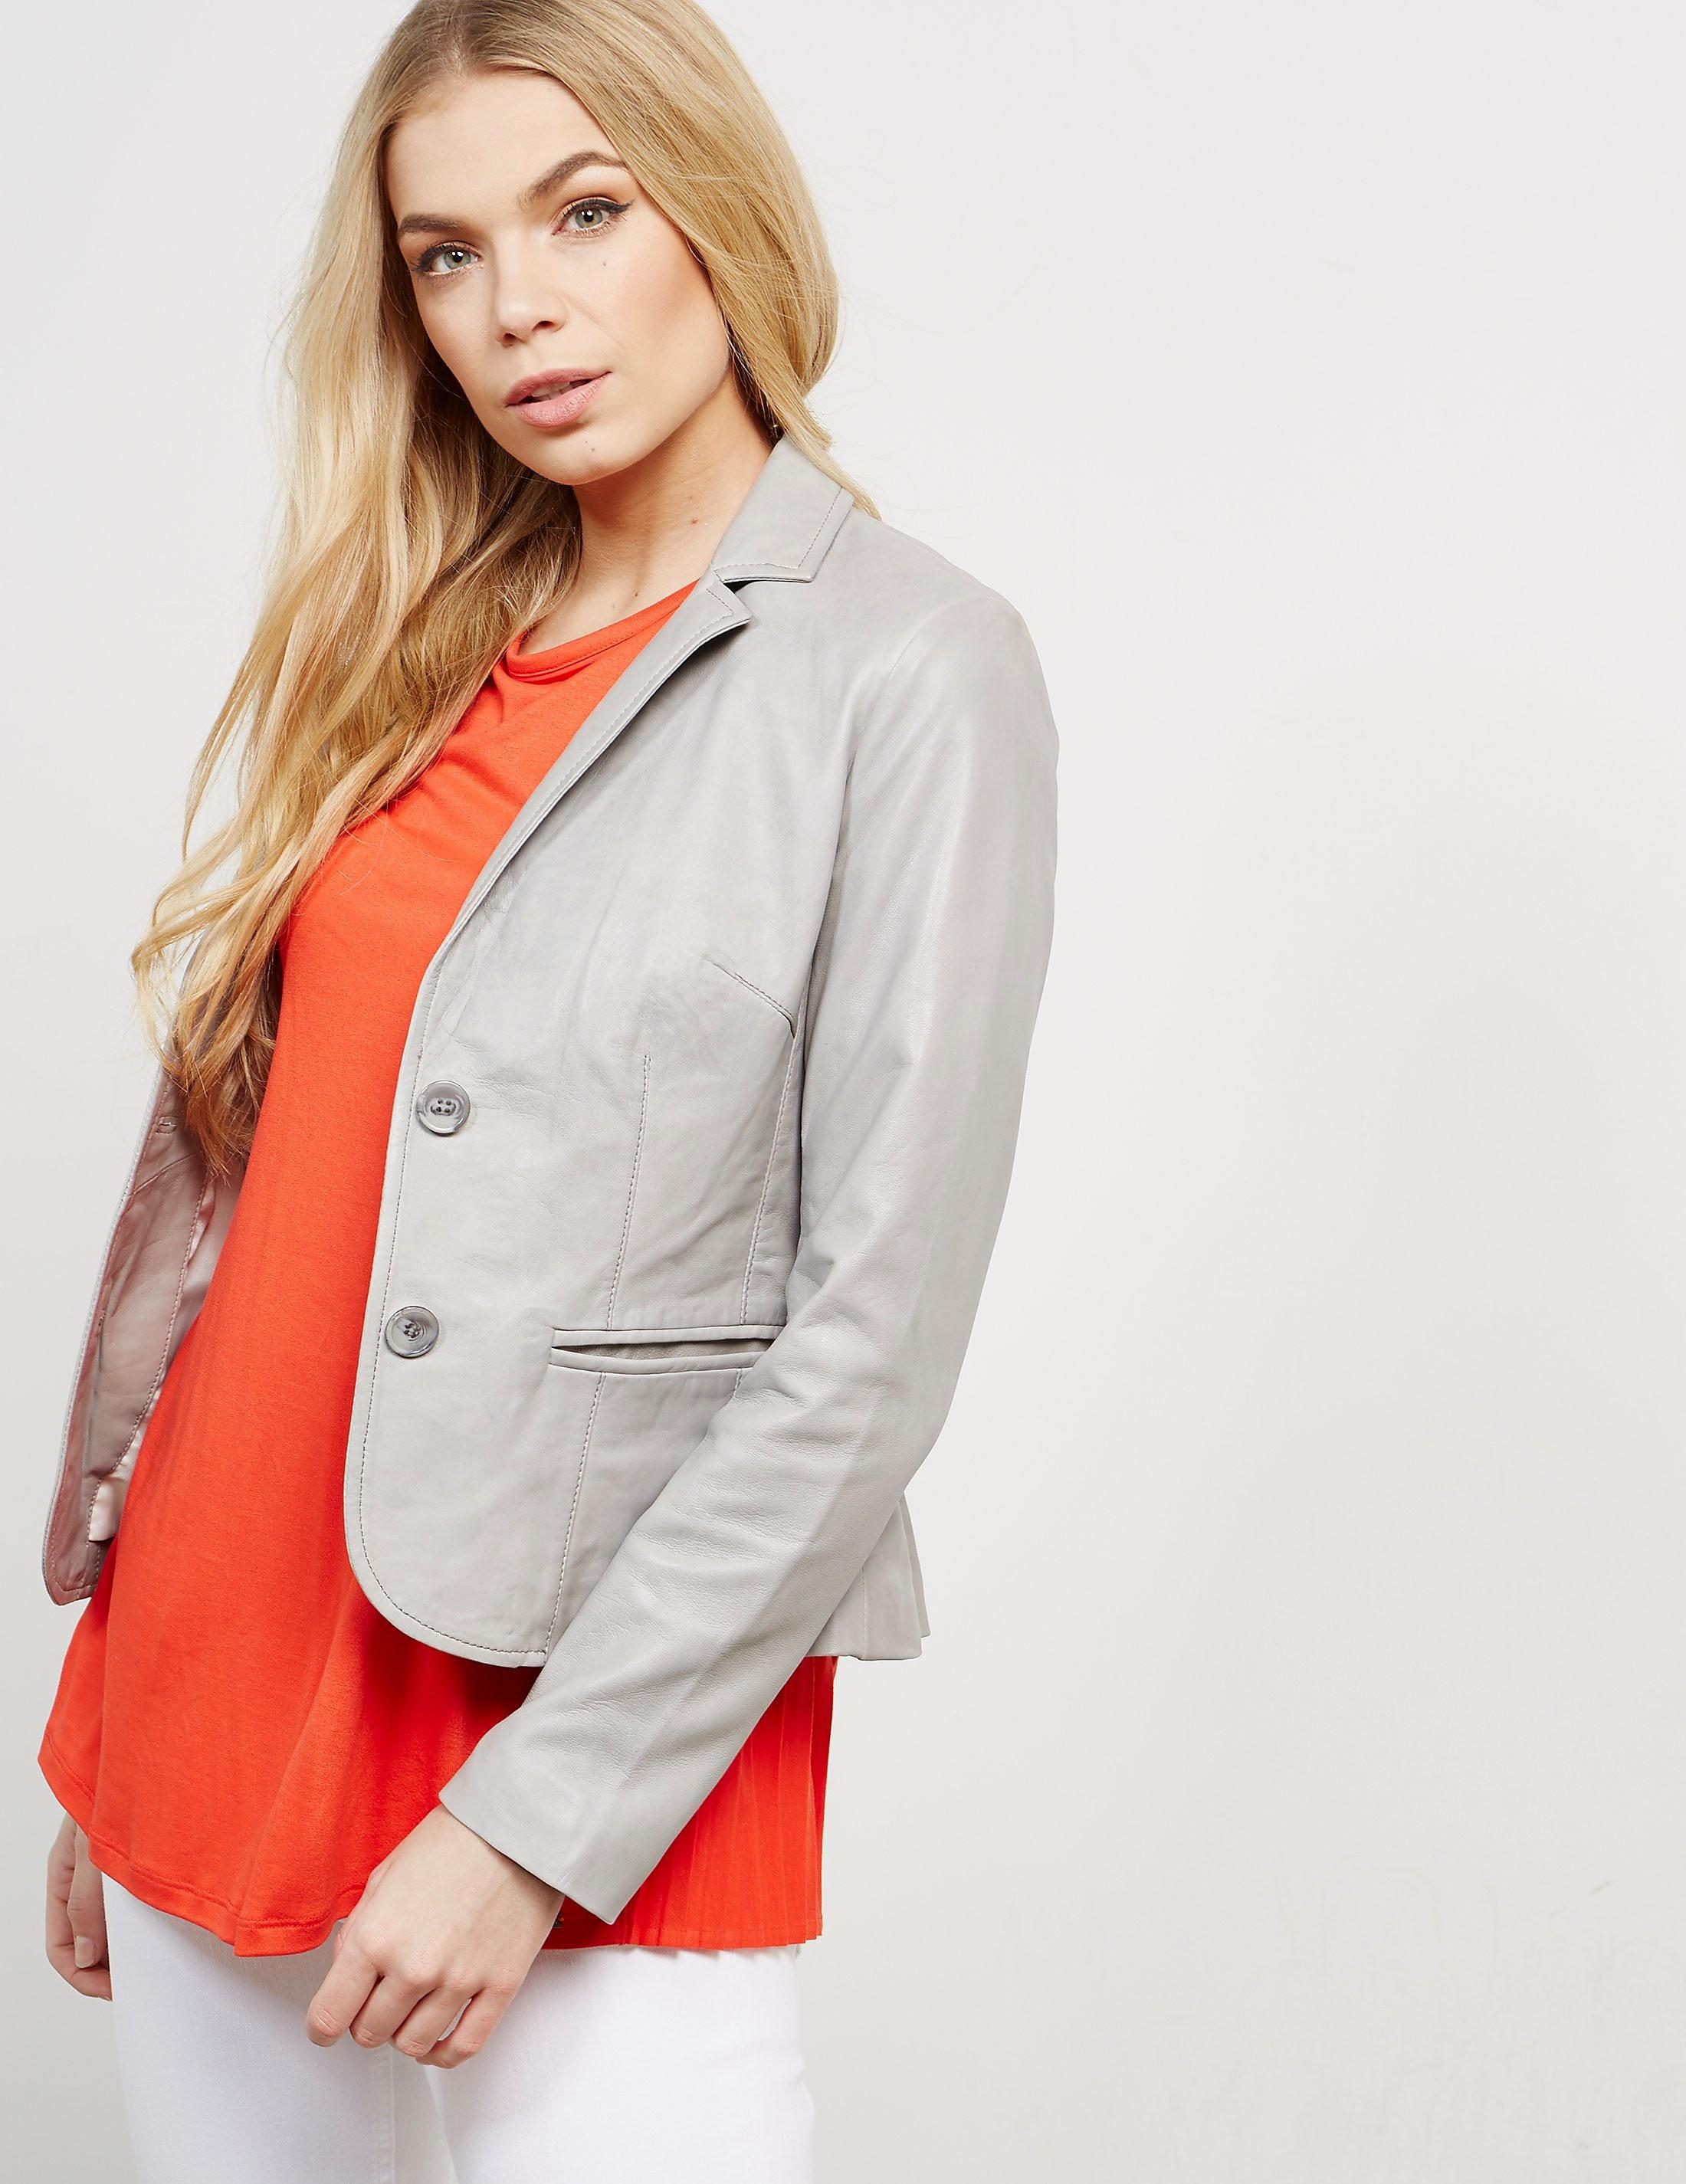 Rino & Pelle Soft Leather Blazer Jacket